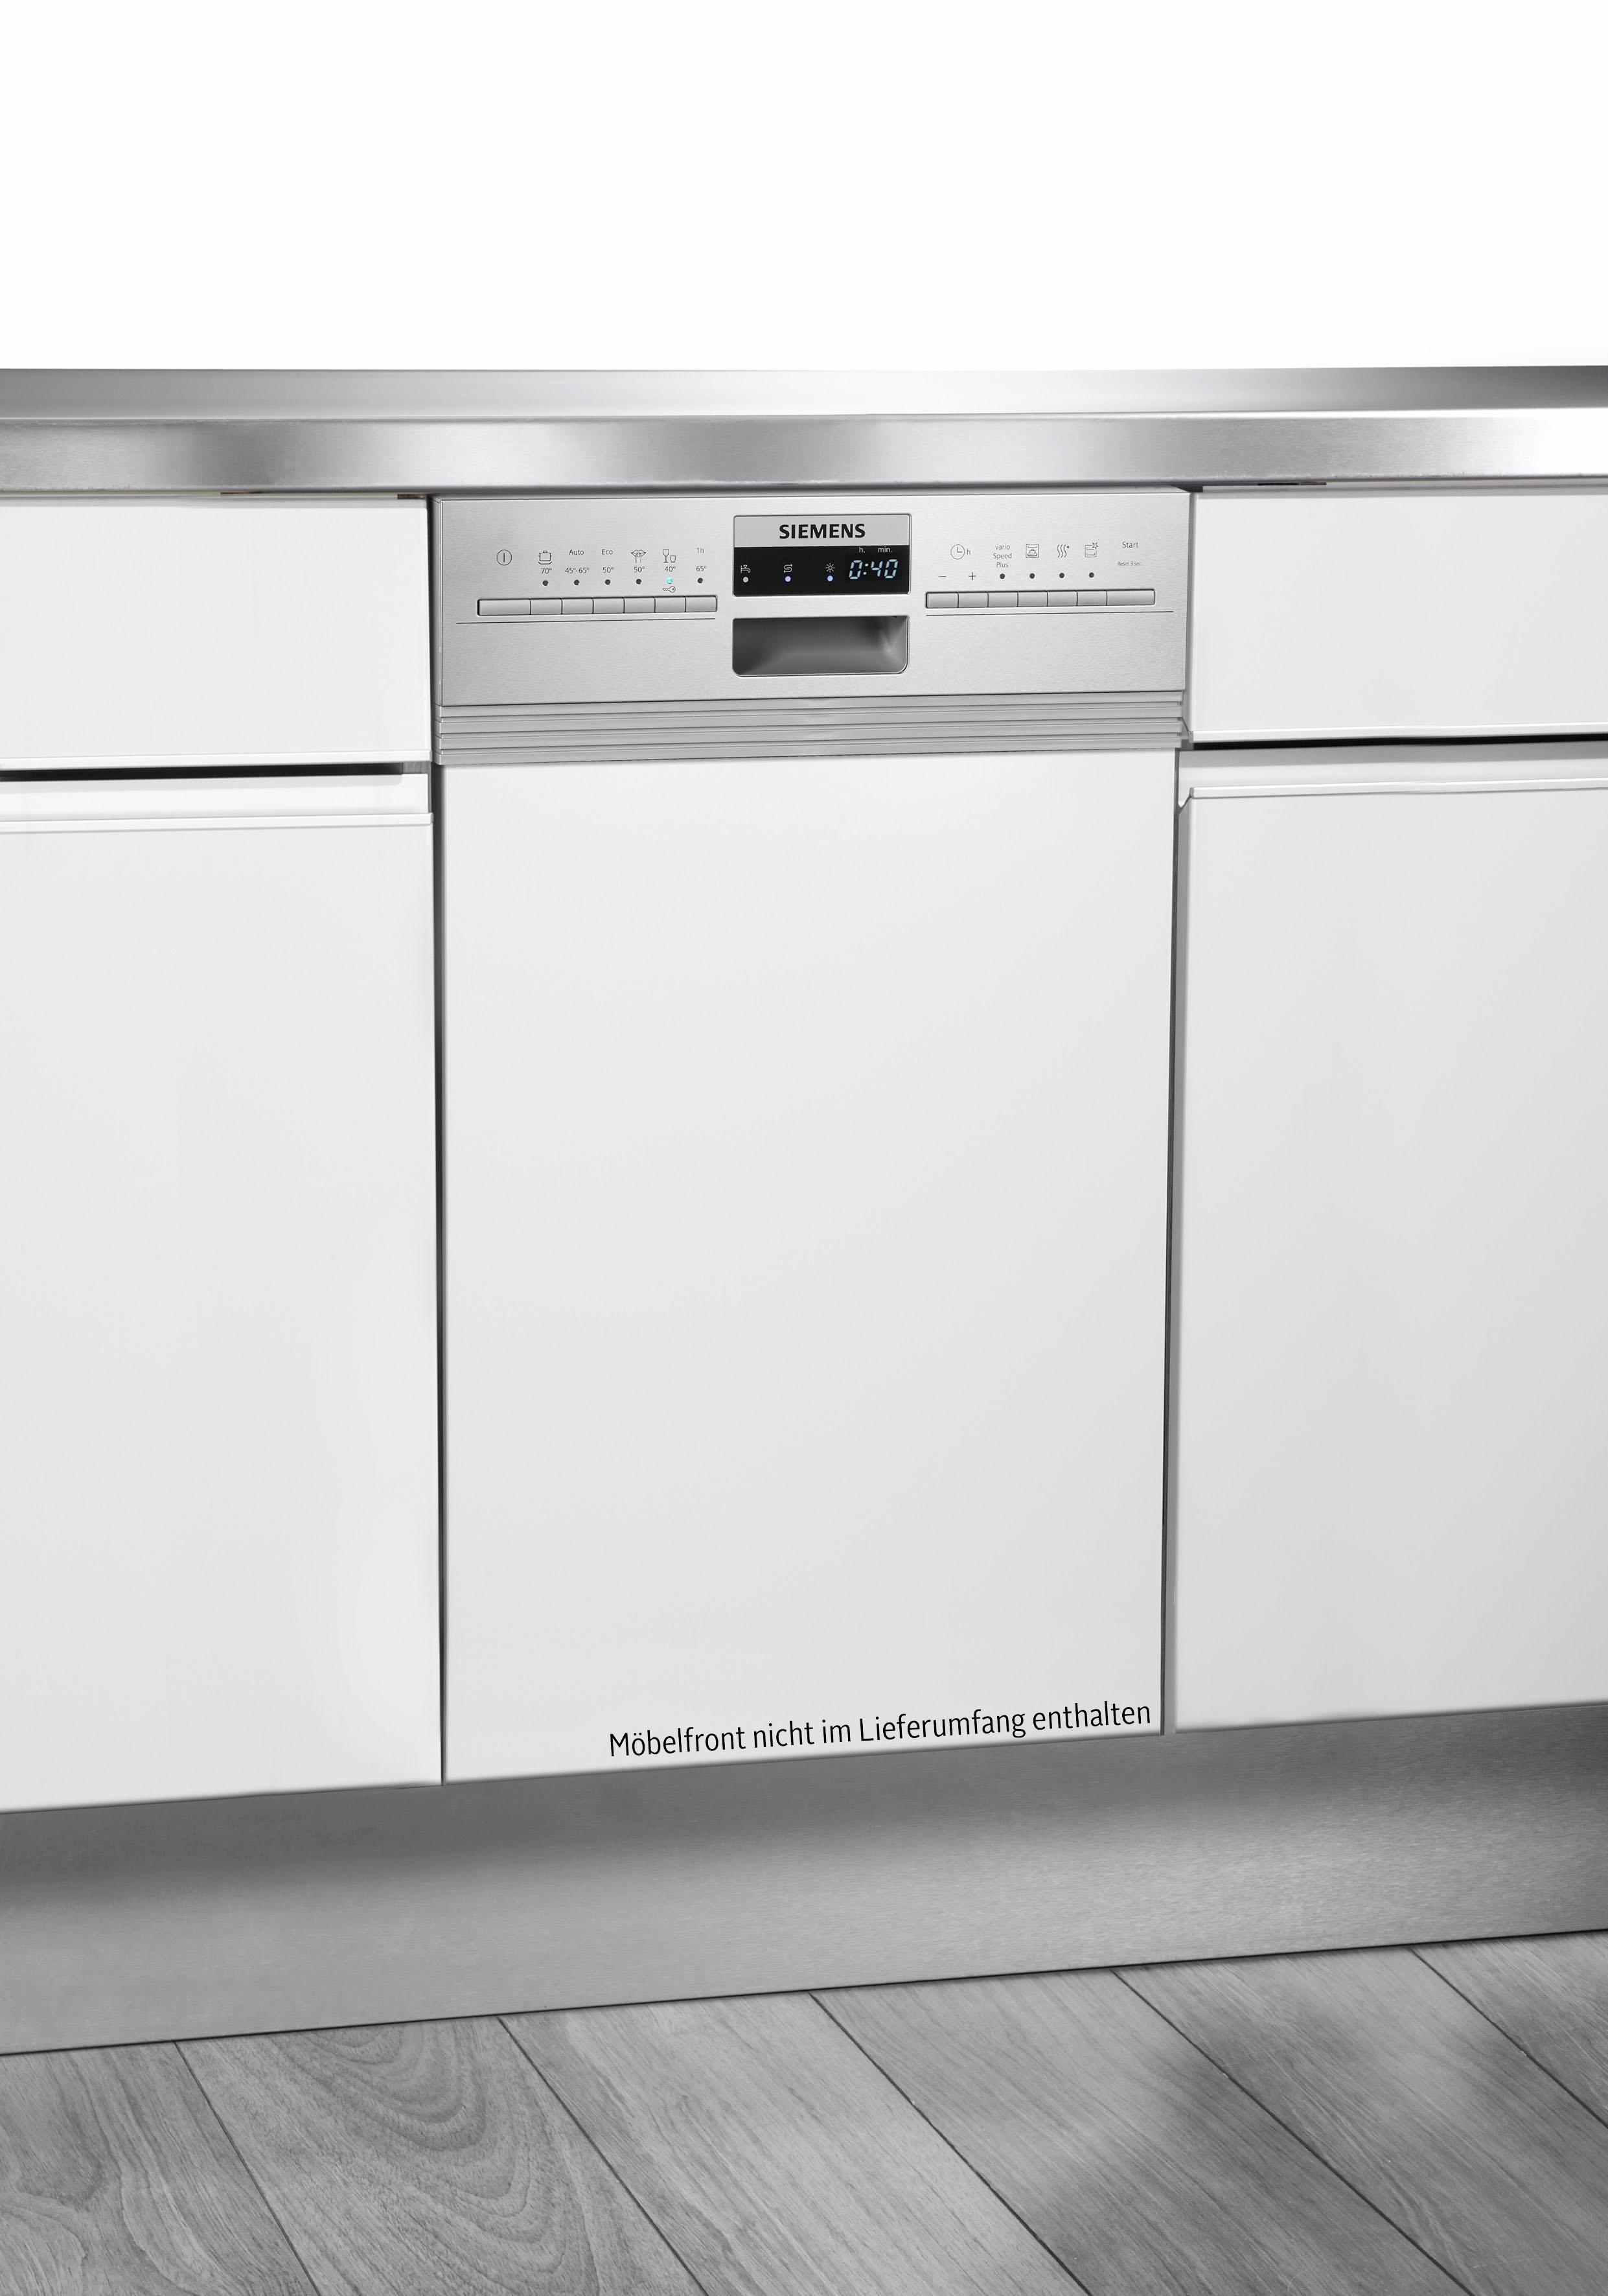 teilintegrierbarer Geschirrspüler, SR536S01ME, 9,5 l, 10 Maßgedecke, 45 cm breit